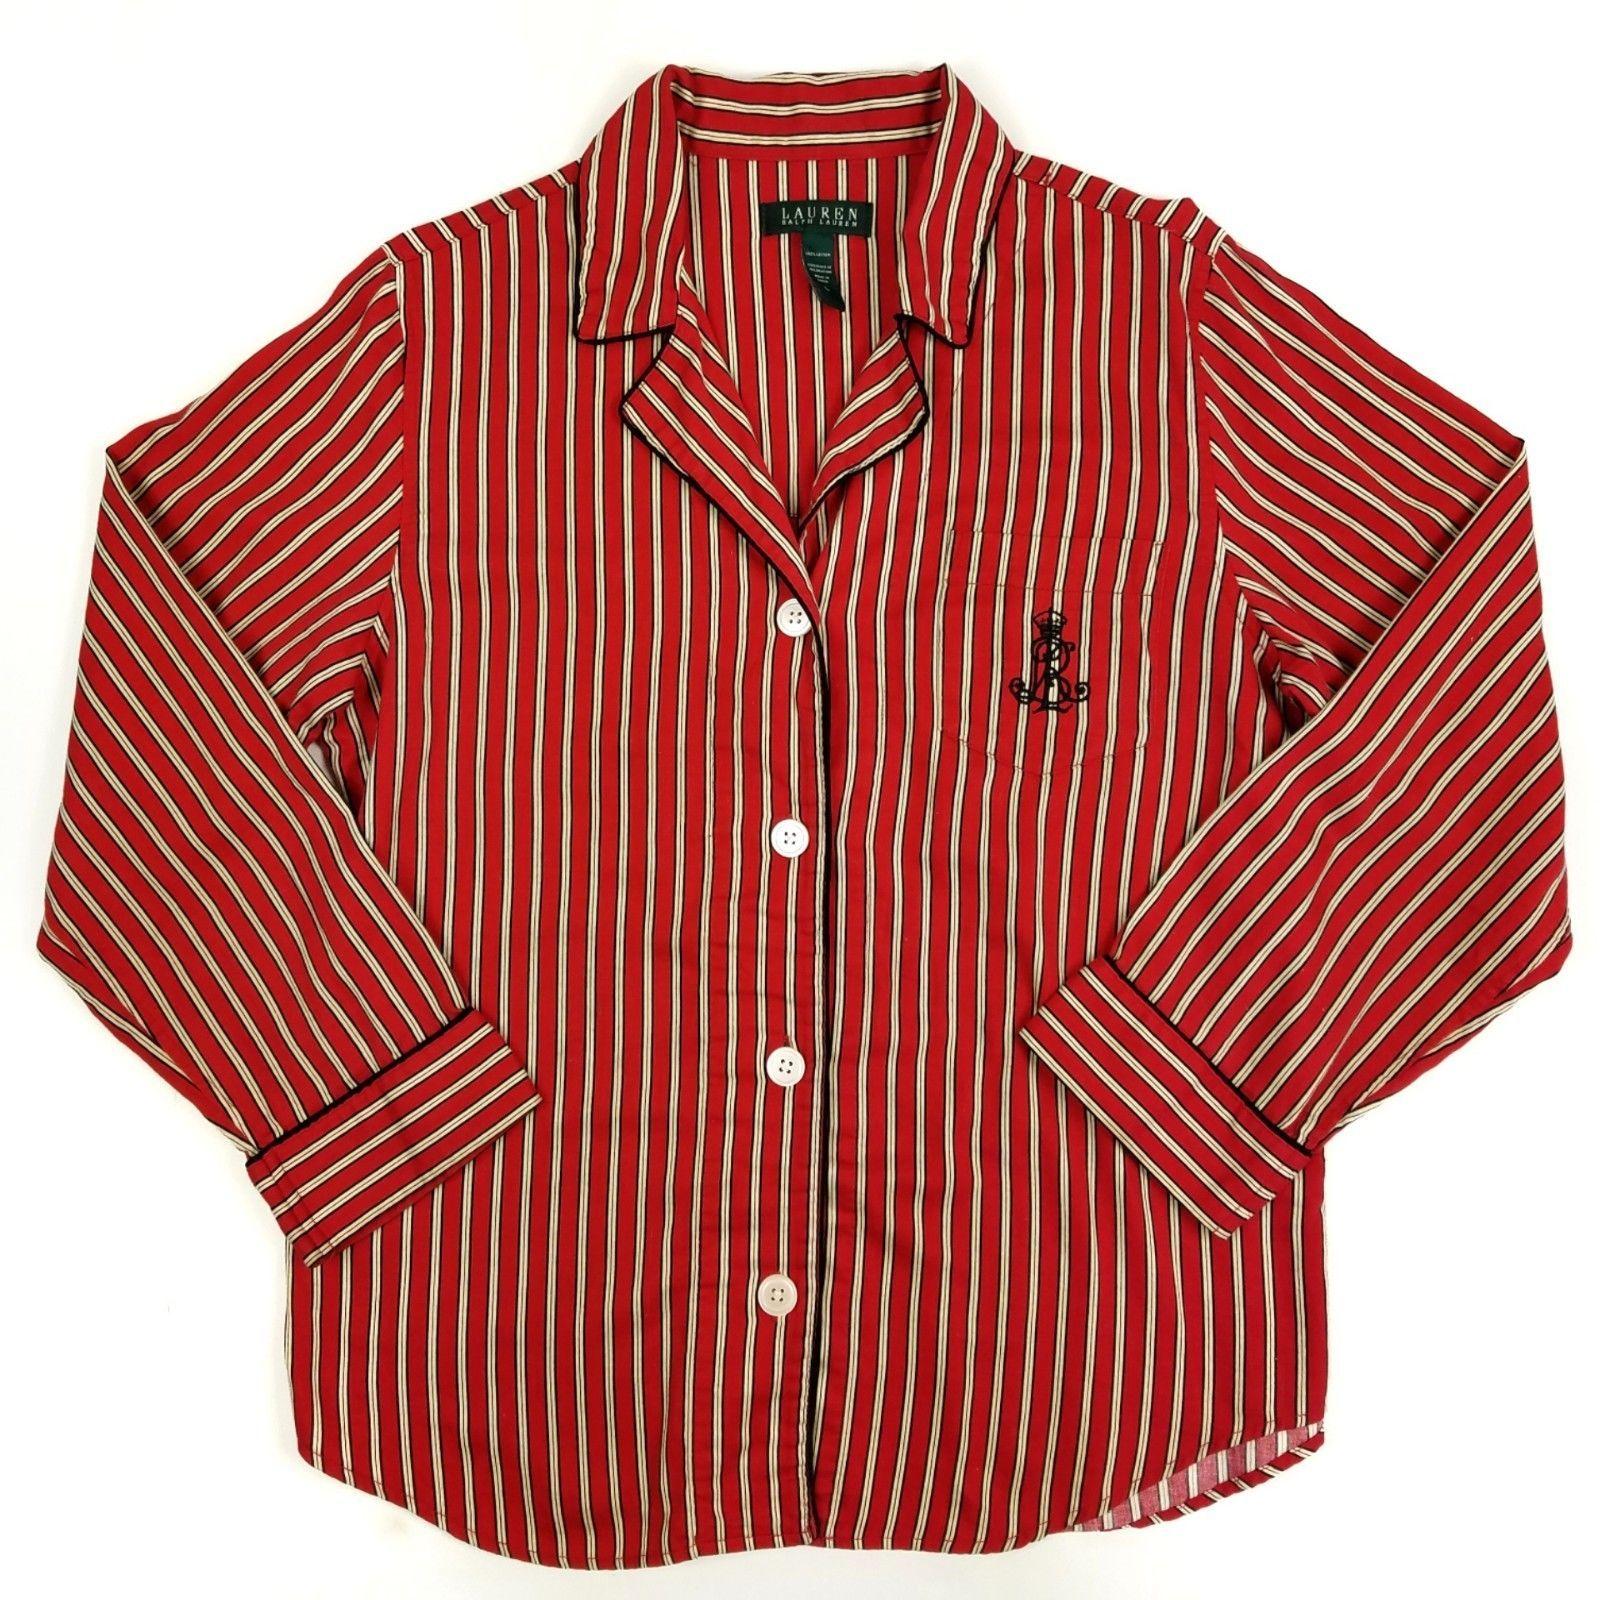 4cfc5c2e9 Ralph lauren Sleepshirt Size Large Womens and 50 similar items